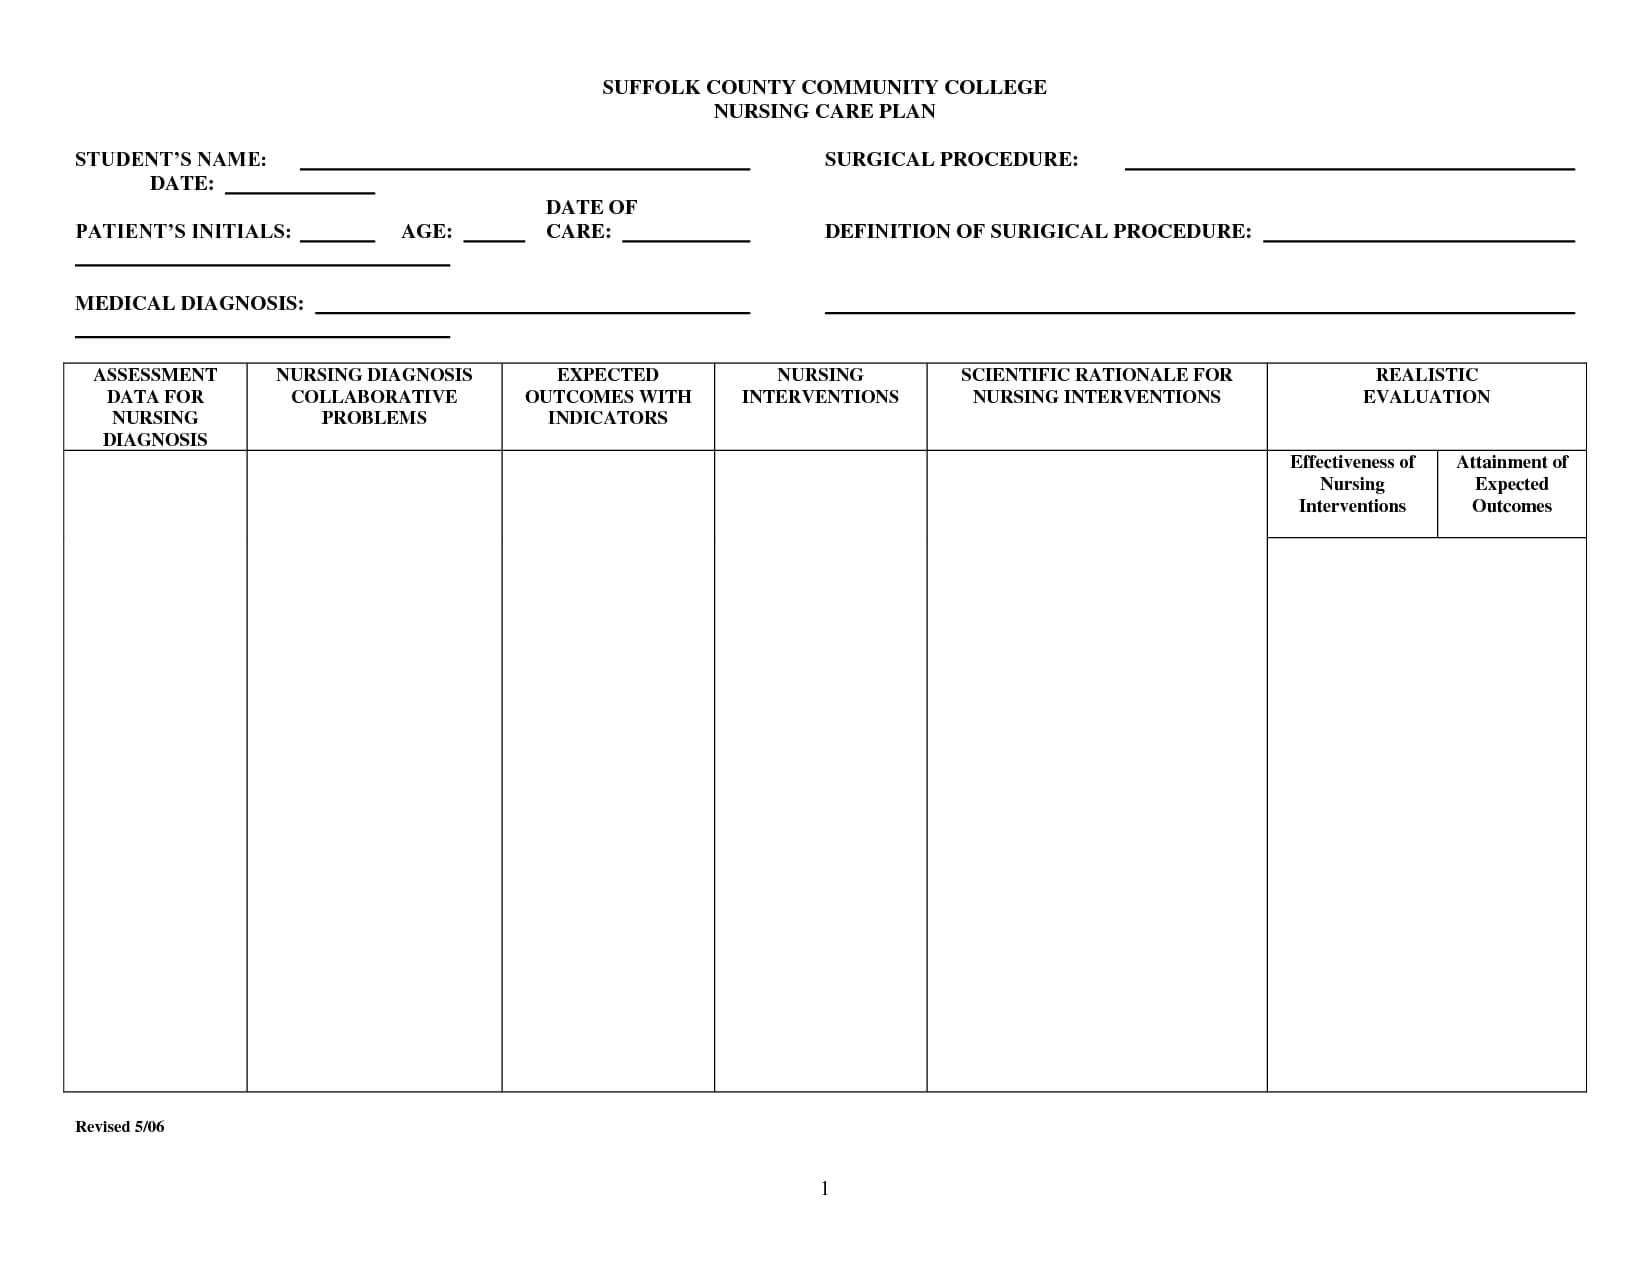 Nursing Care Plan Templates Blank - Atlantaauctionco With Regard To Nursing Care Plan Templates Blank